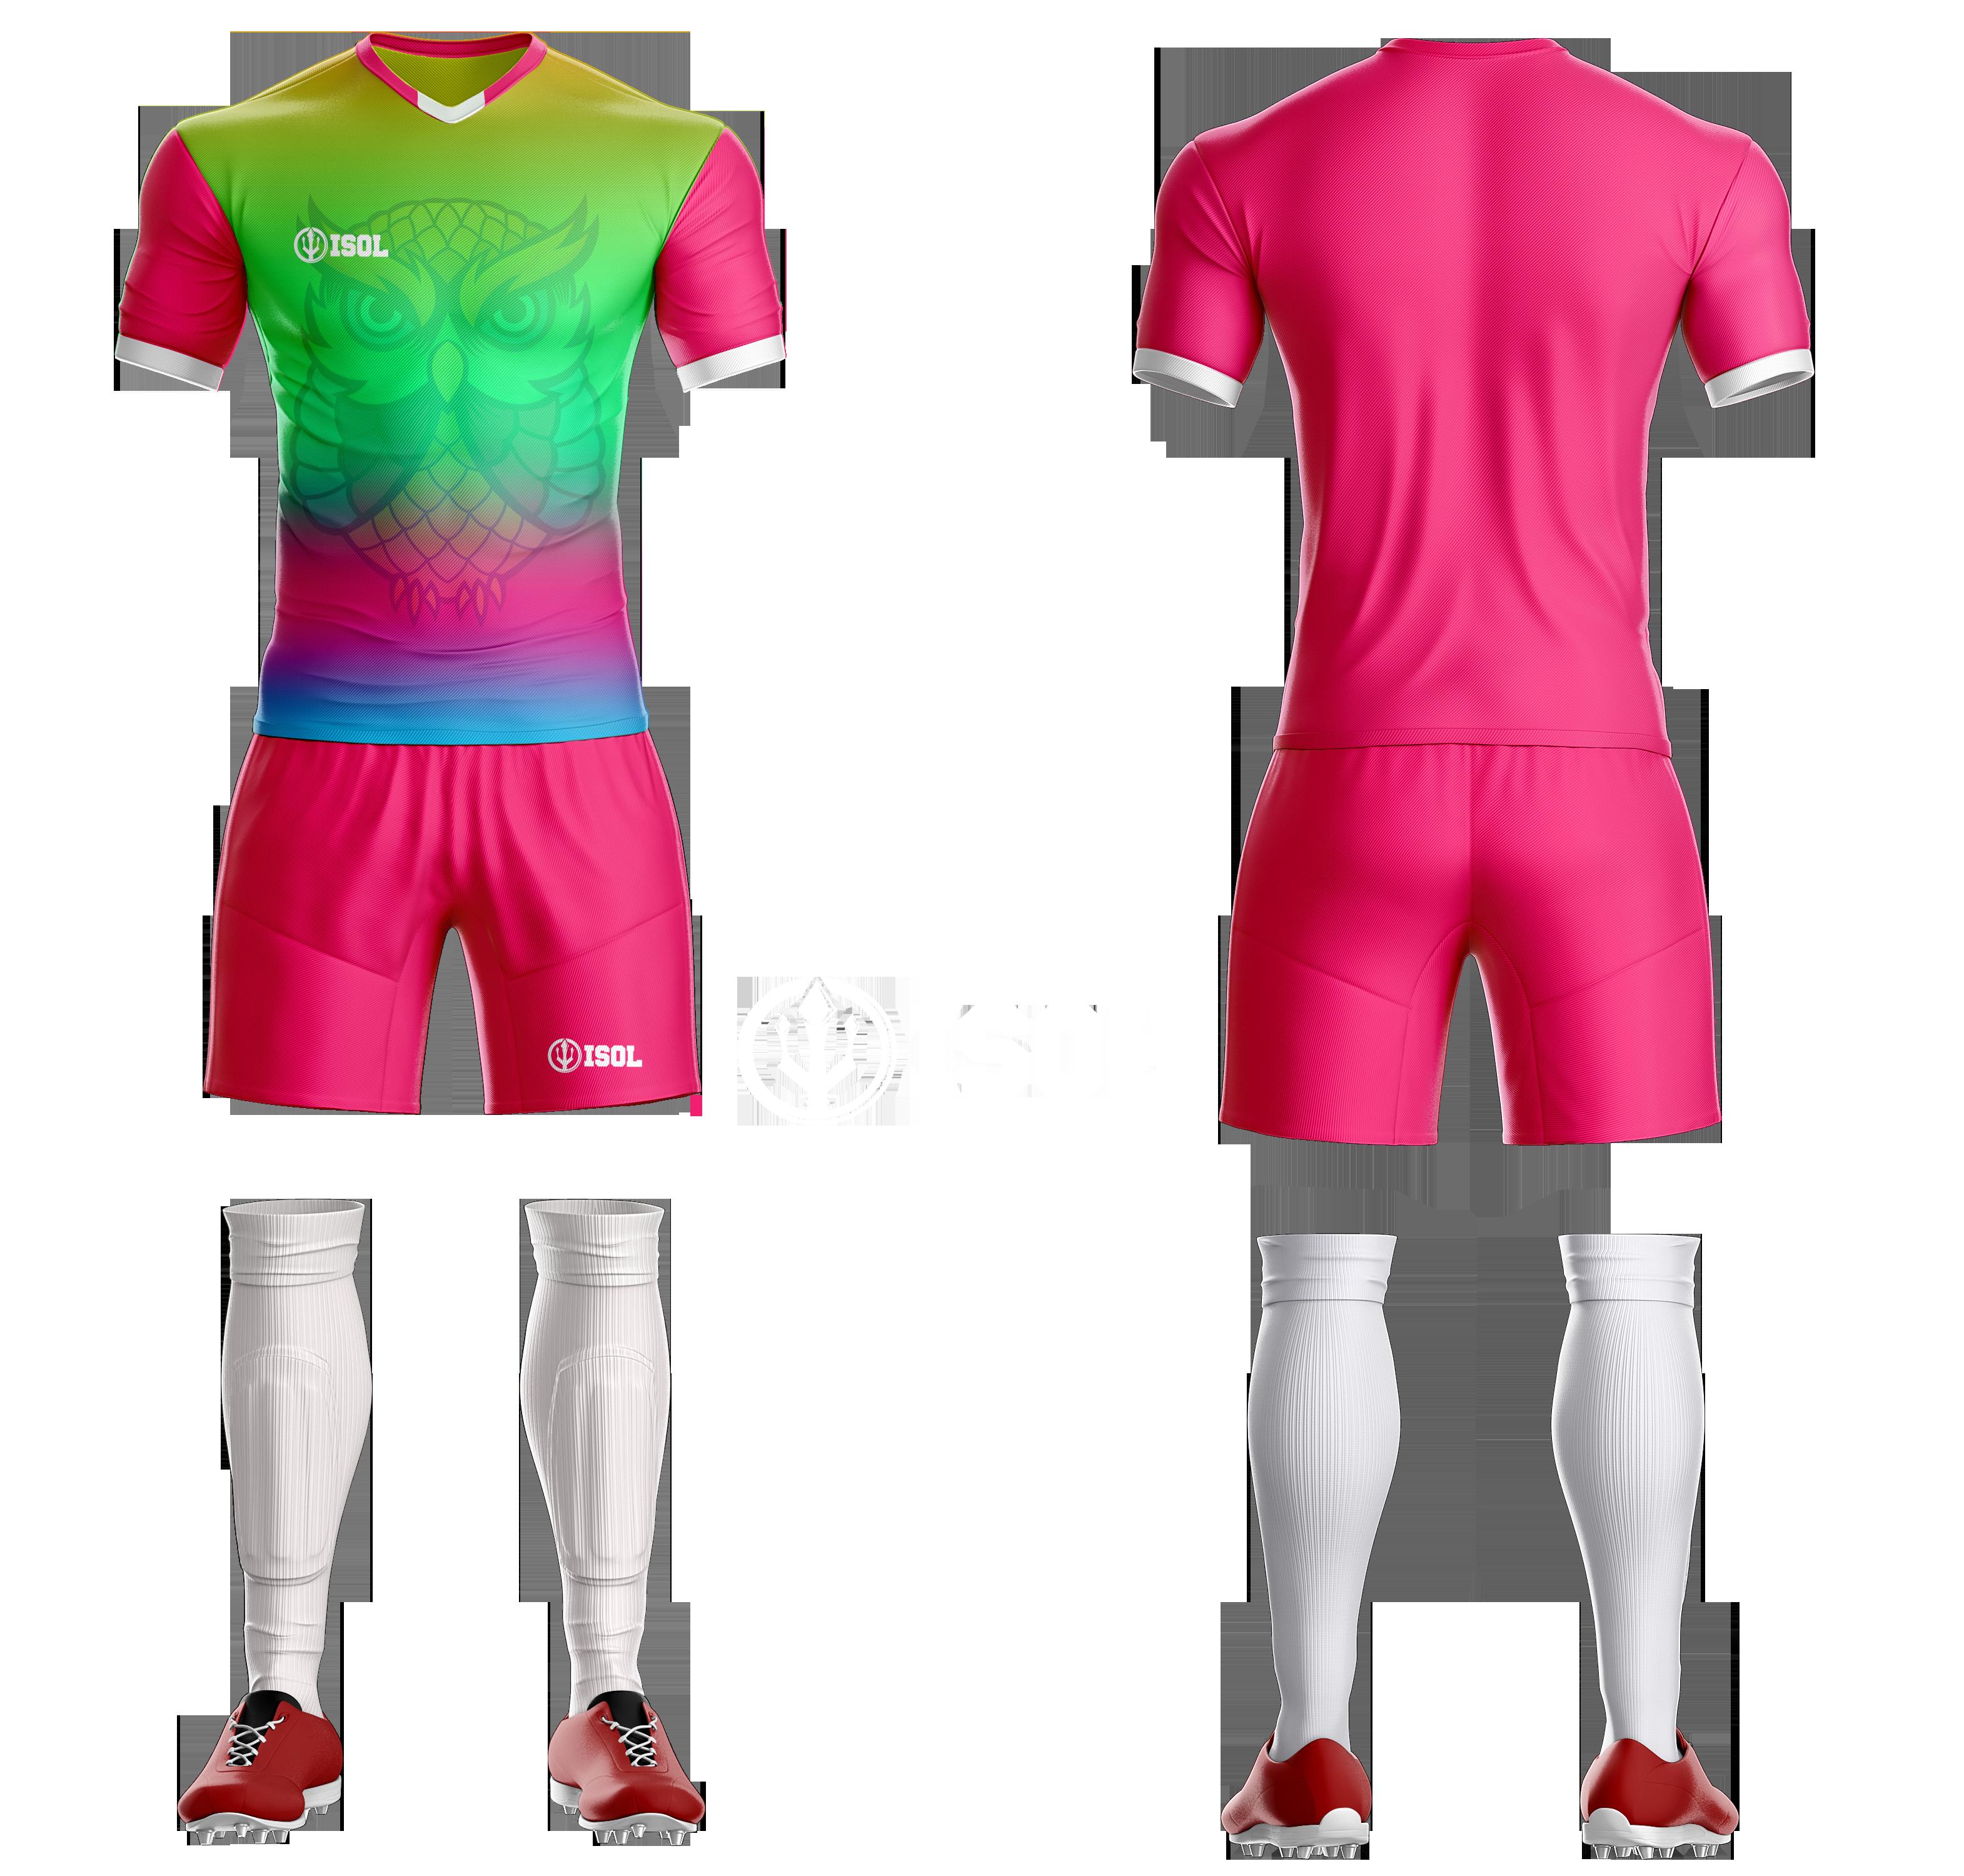 Custom Jersey Futsal Keren Polos Dan Printing Desain Kostum